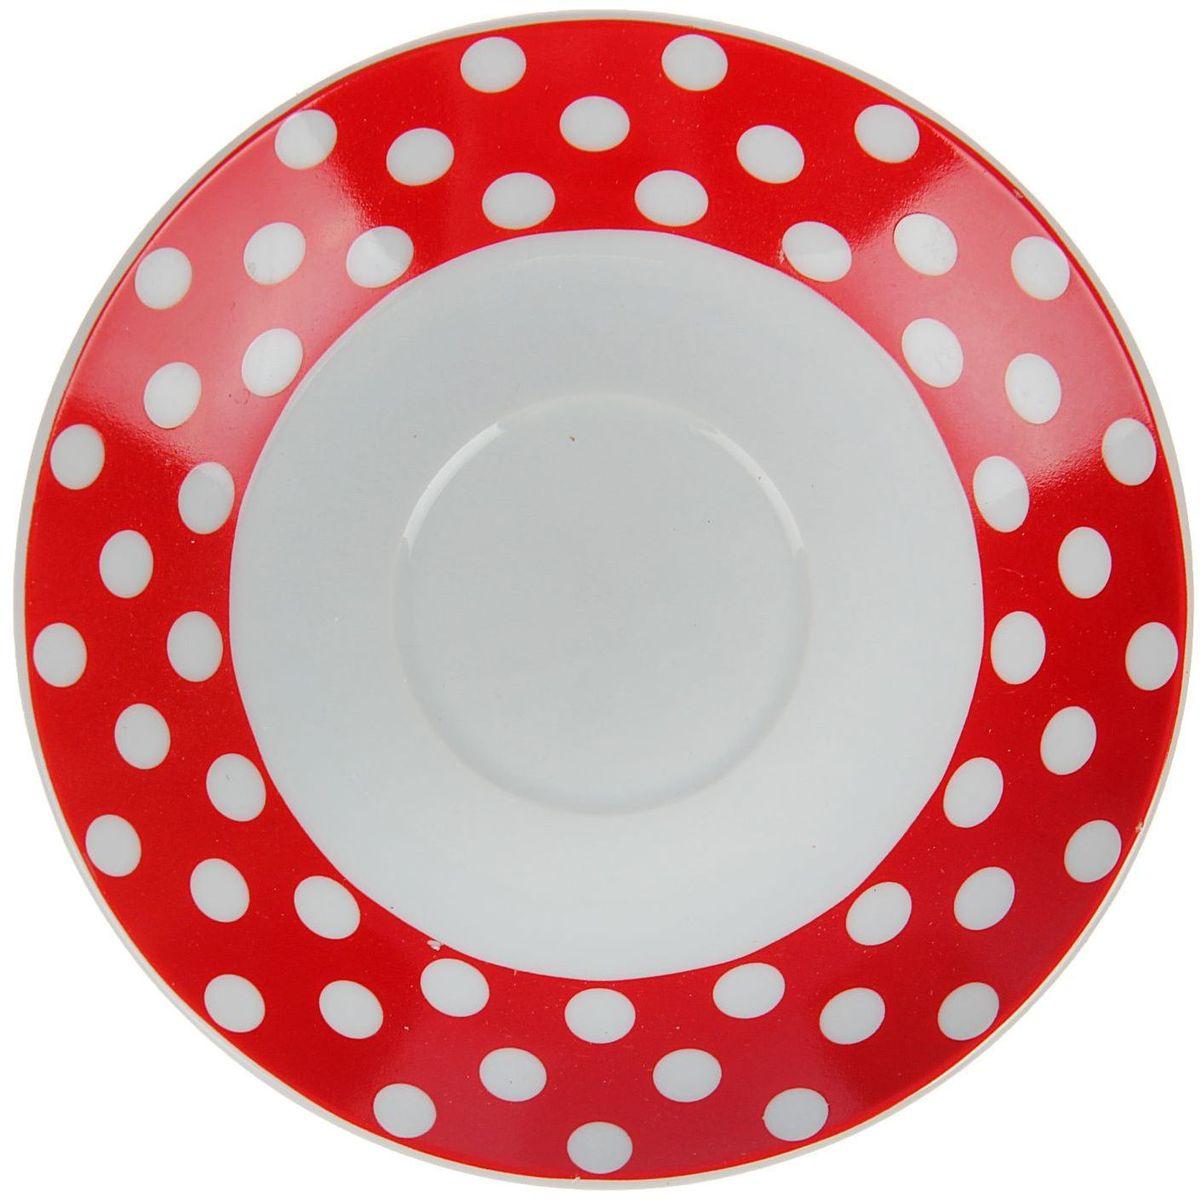 Чашки и тарелки картинки для детей